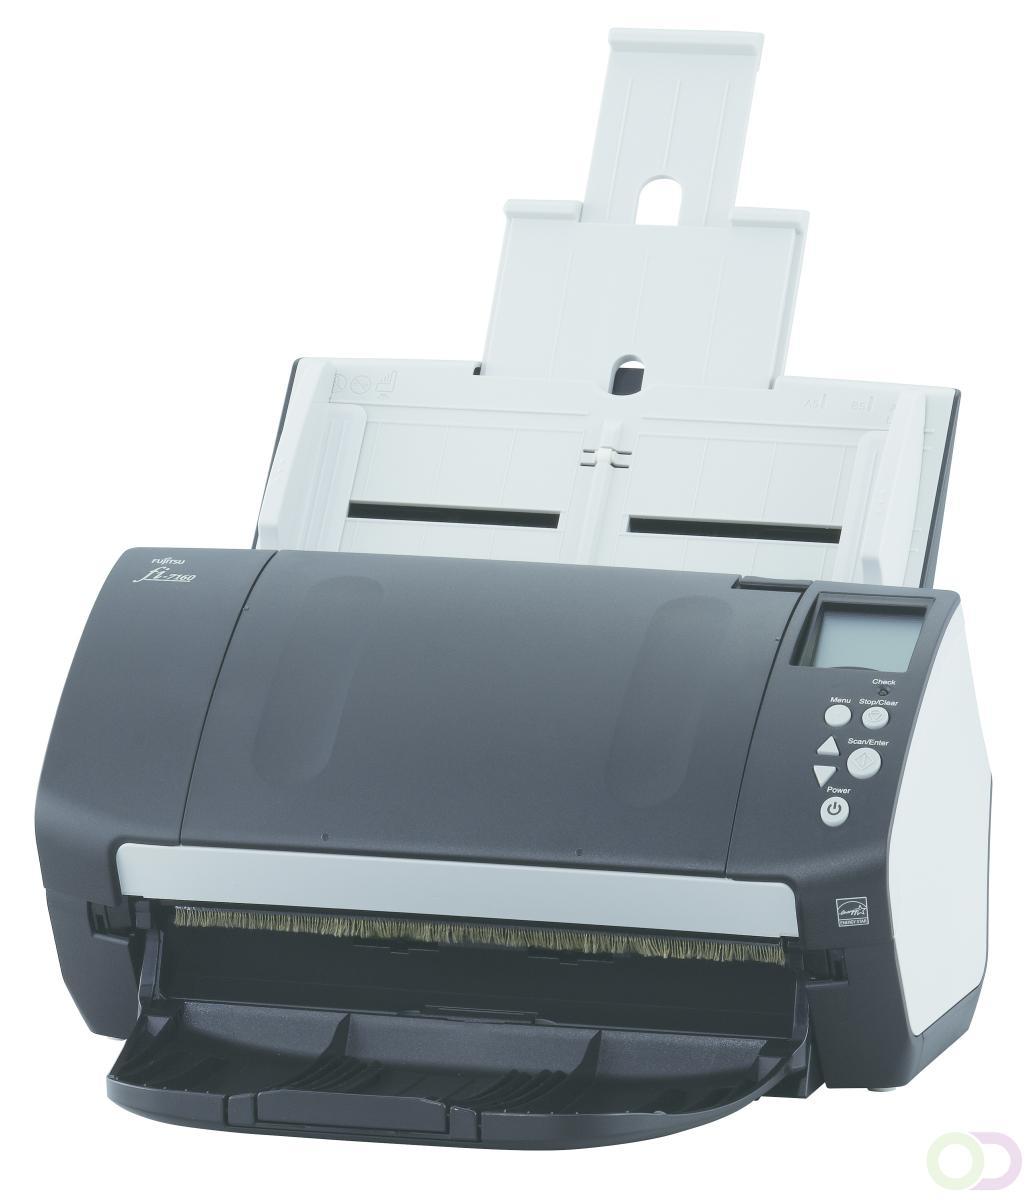 Fujitsu Document Scanner fi-7160